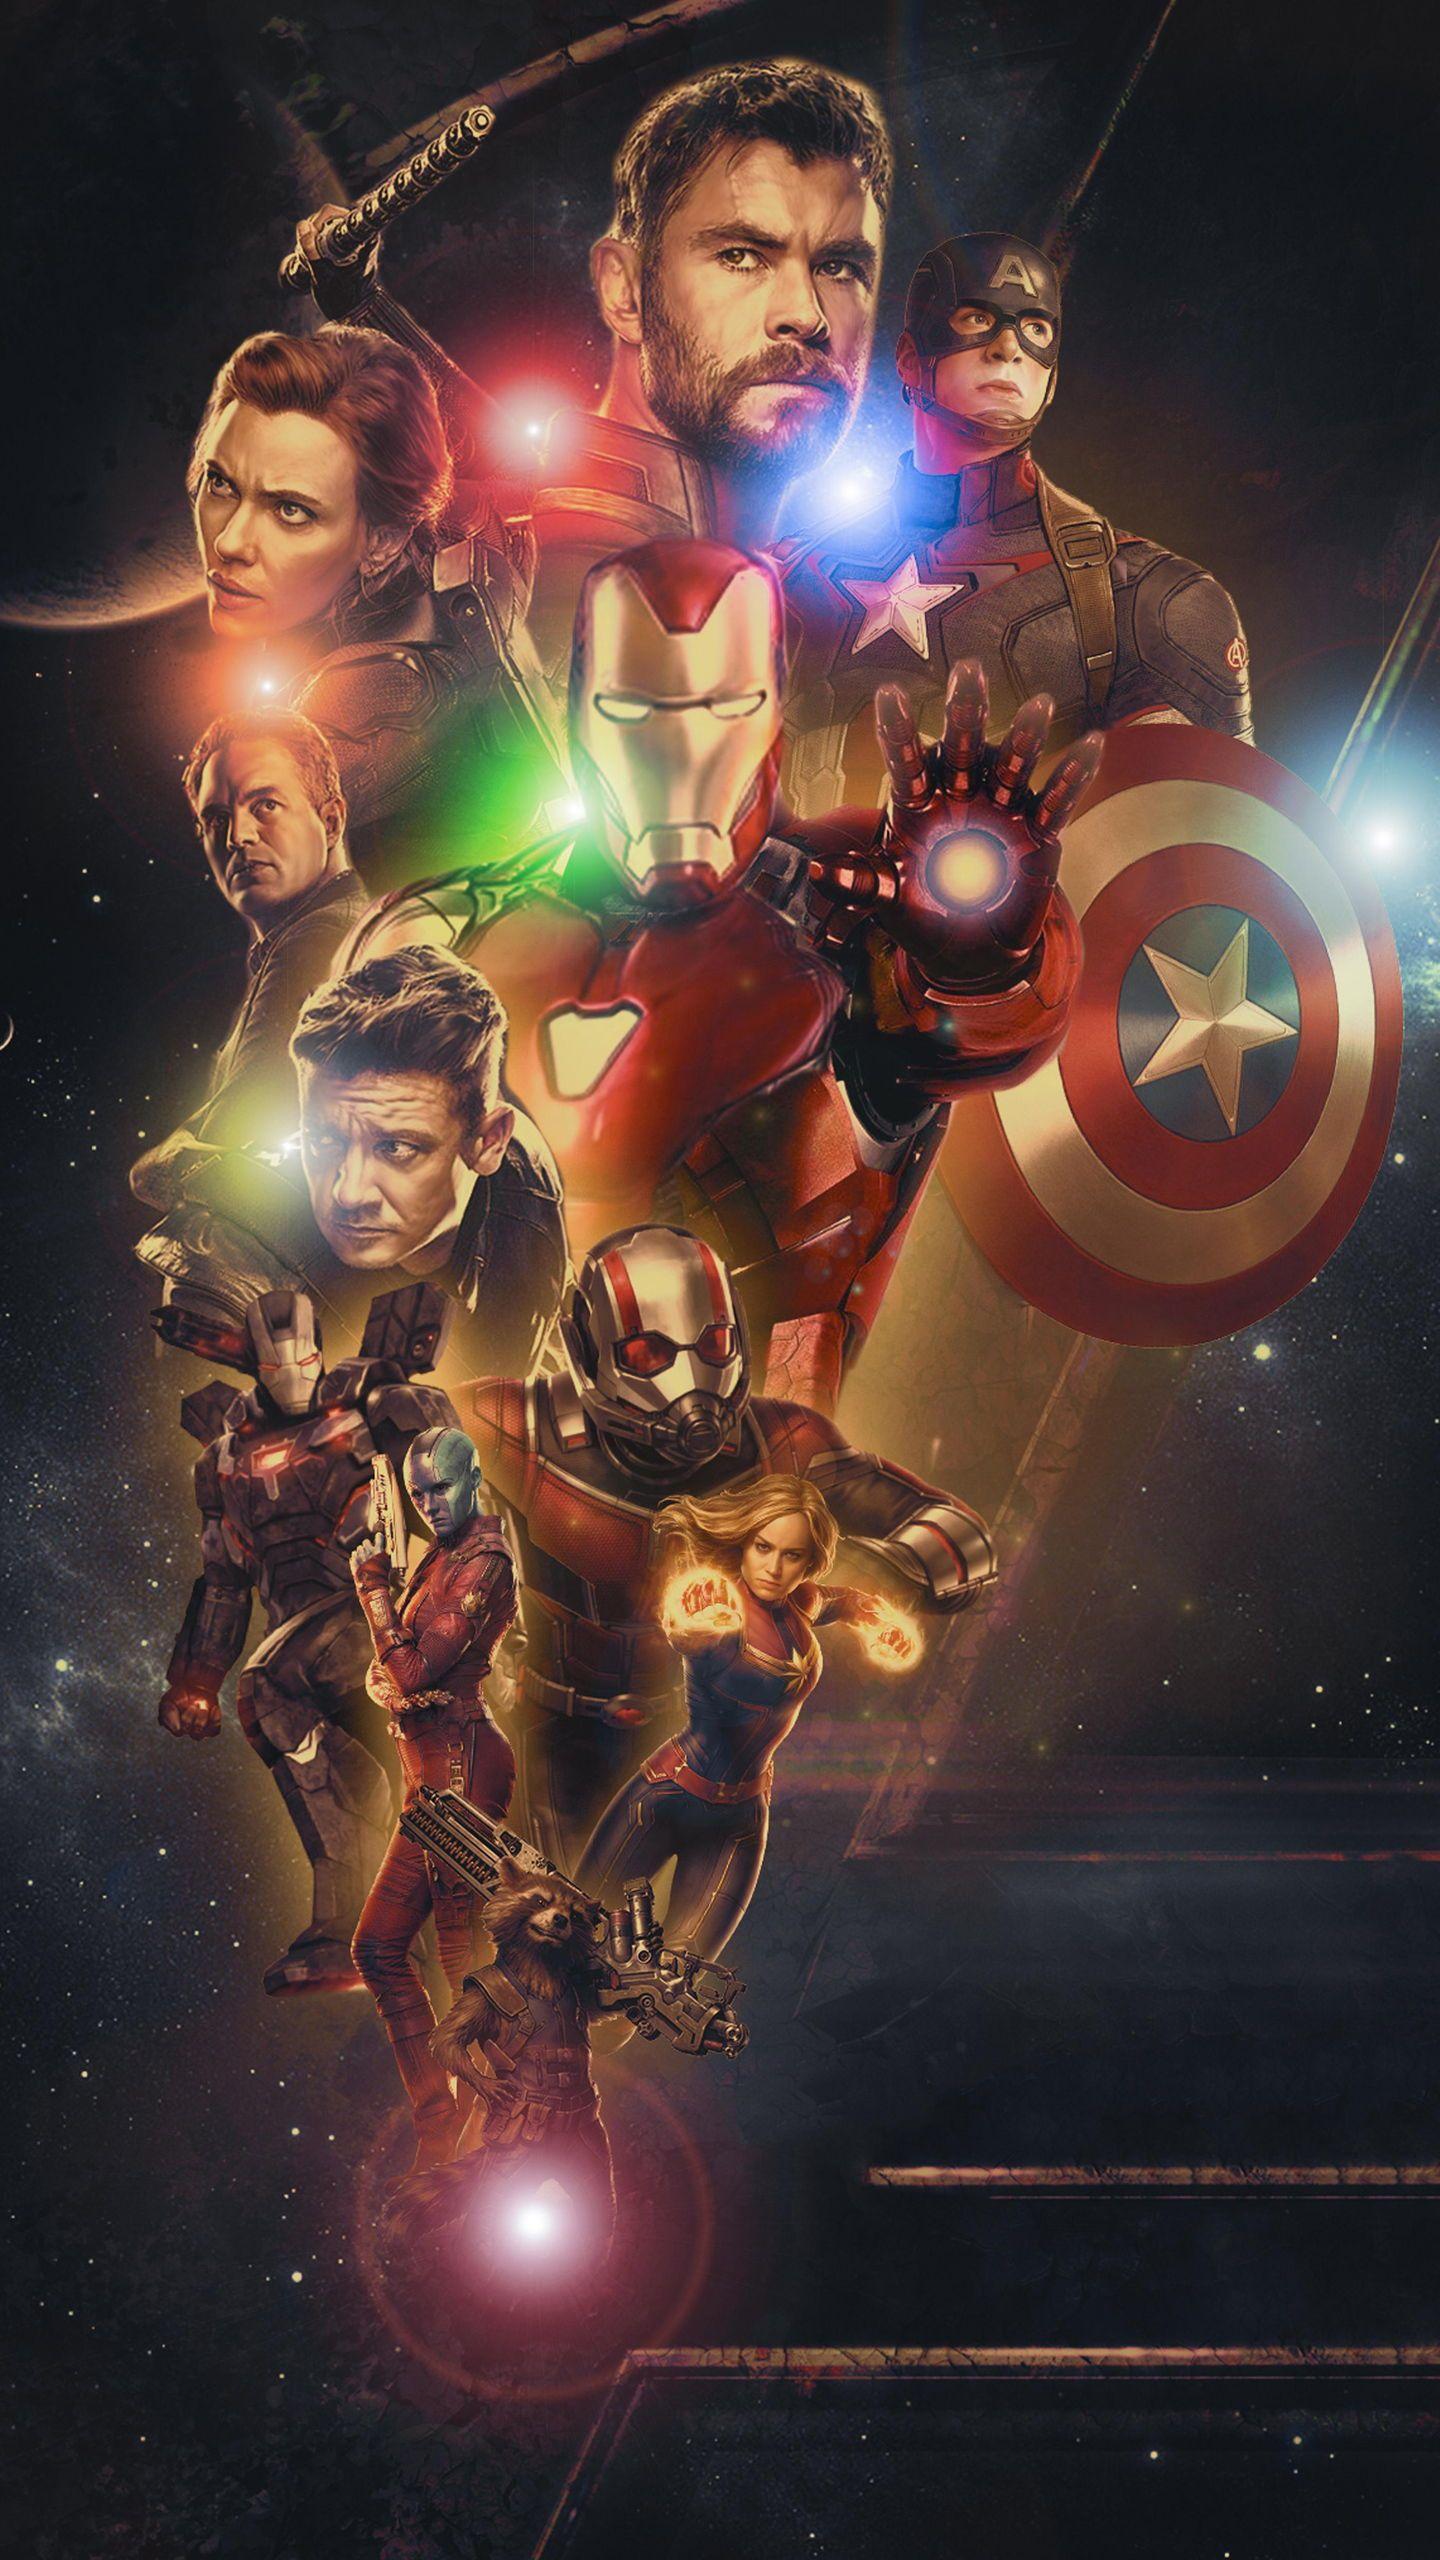 List of Cool Marvel Wallpaper for Smartphones Today